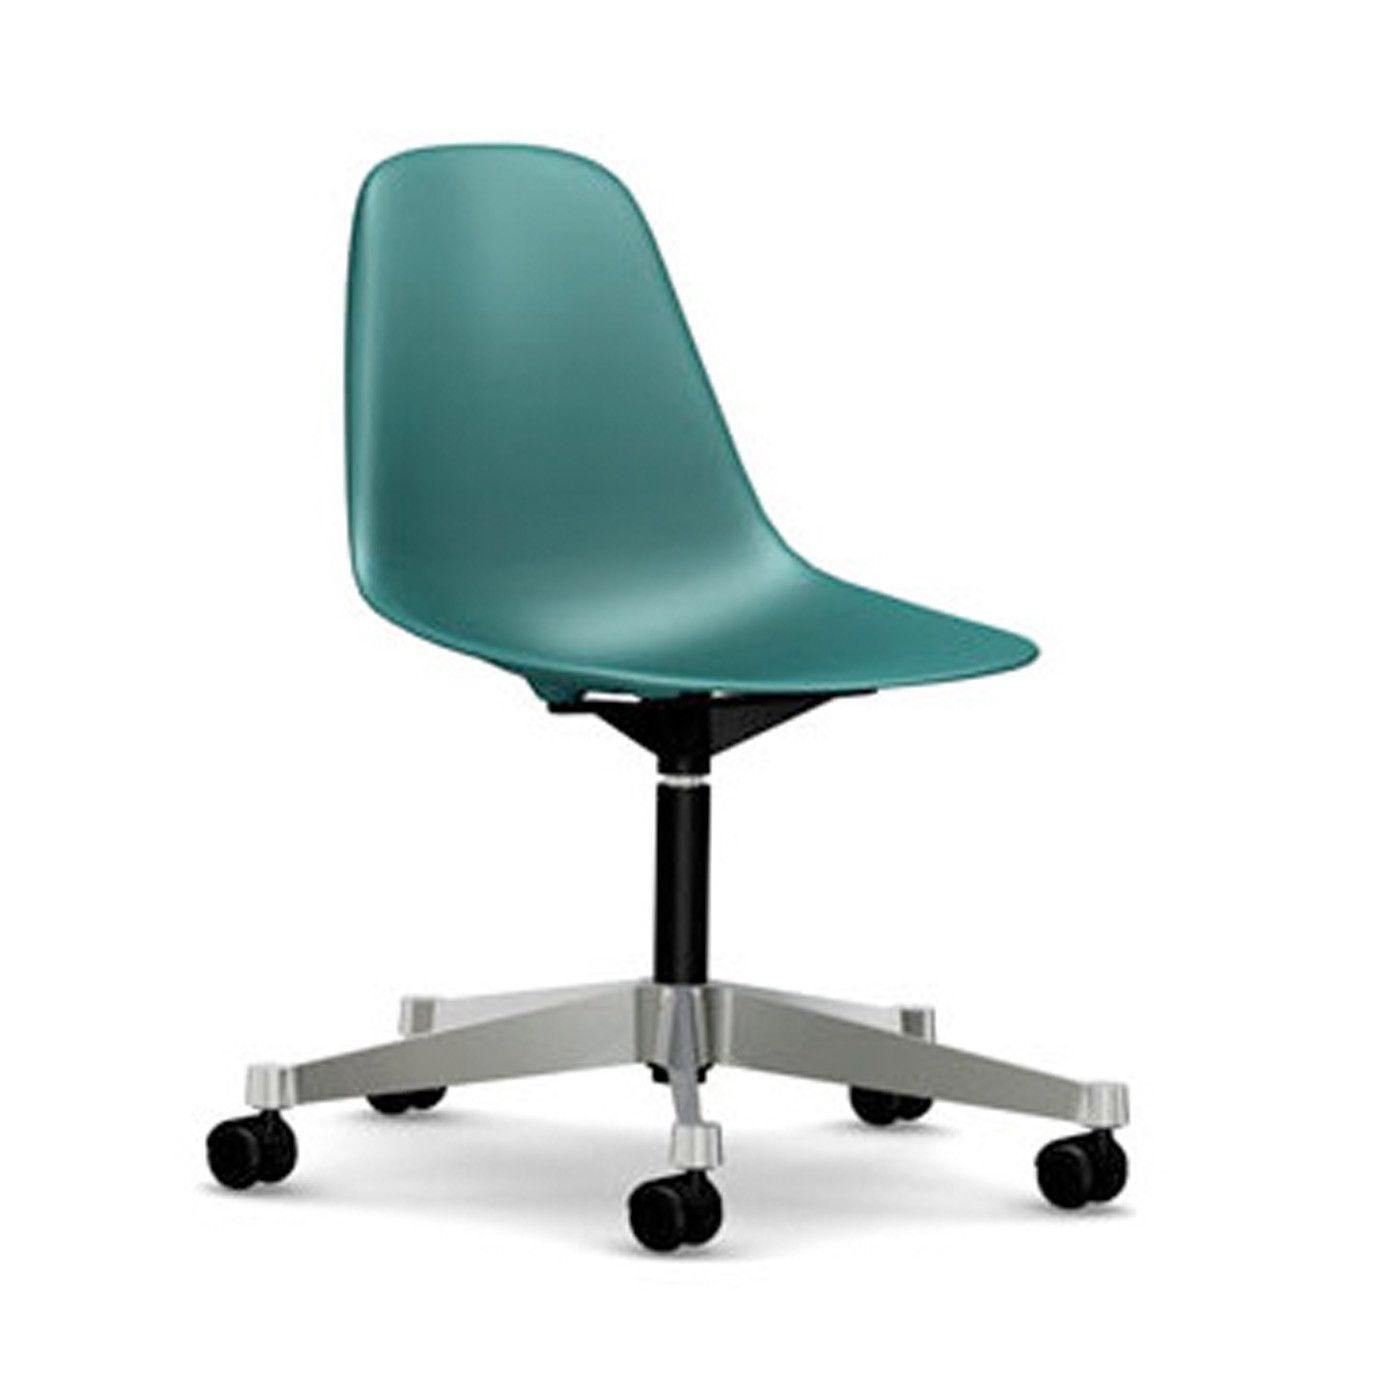 Eames Pscc Office Chair Chair Eames Home Decor